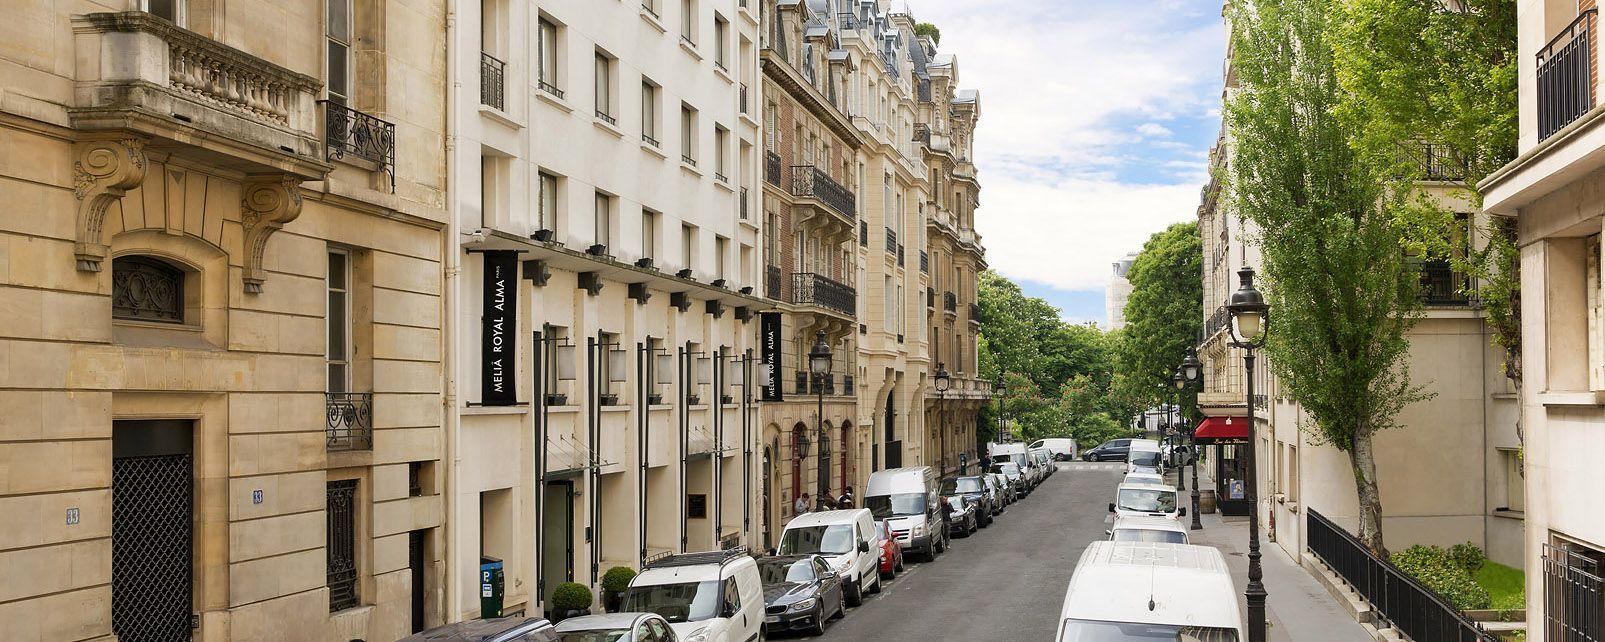 Hotel Melia Paris Tour Eiffel